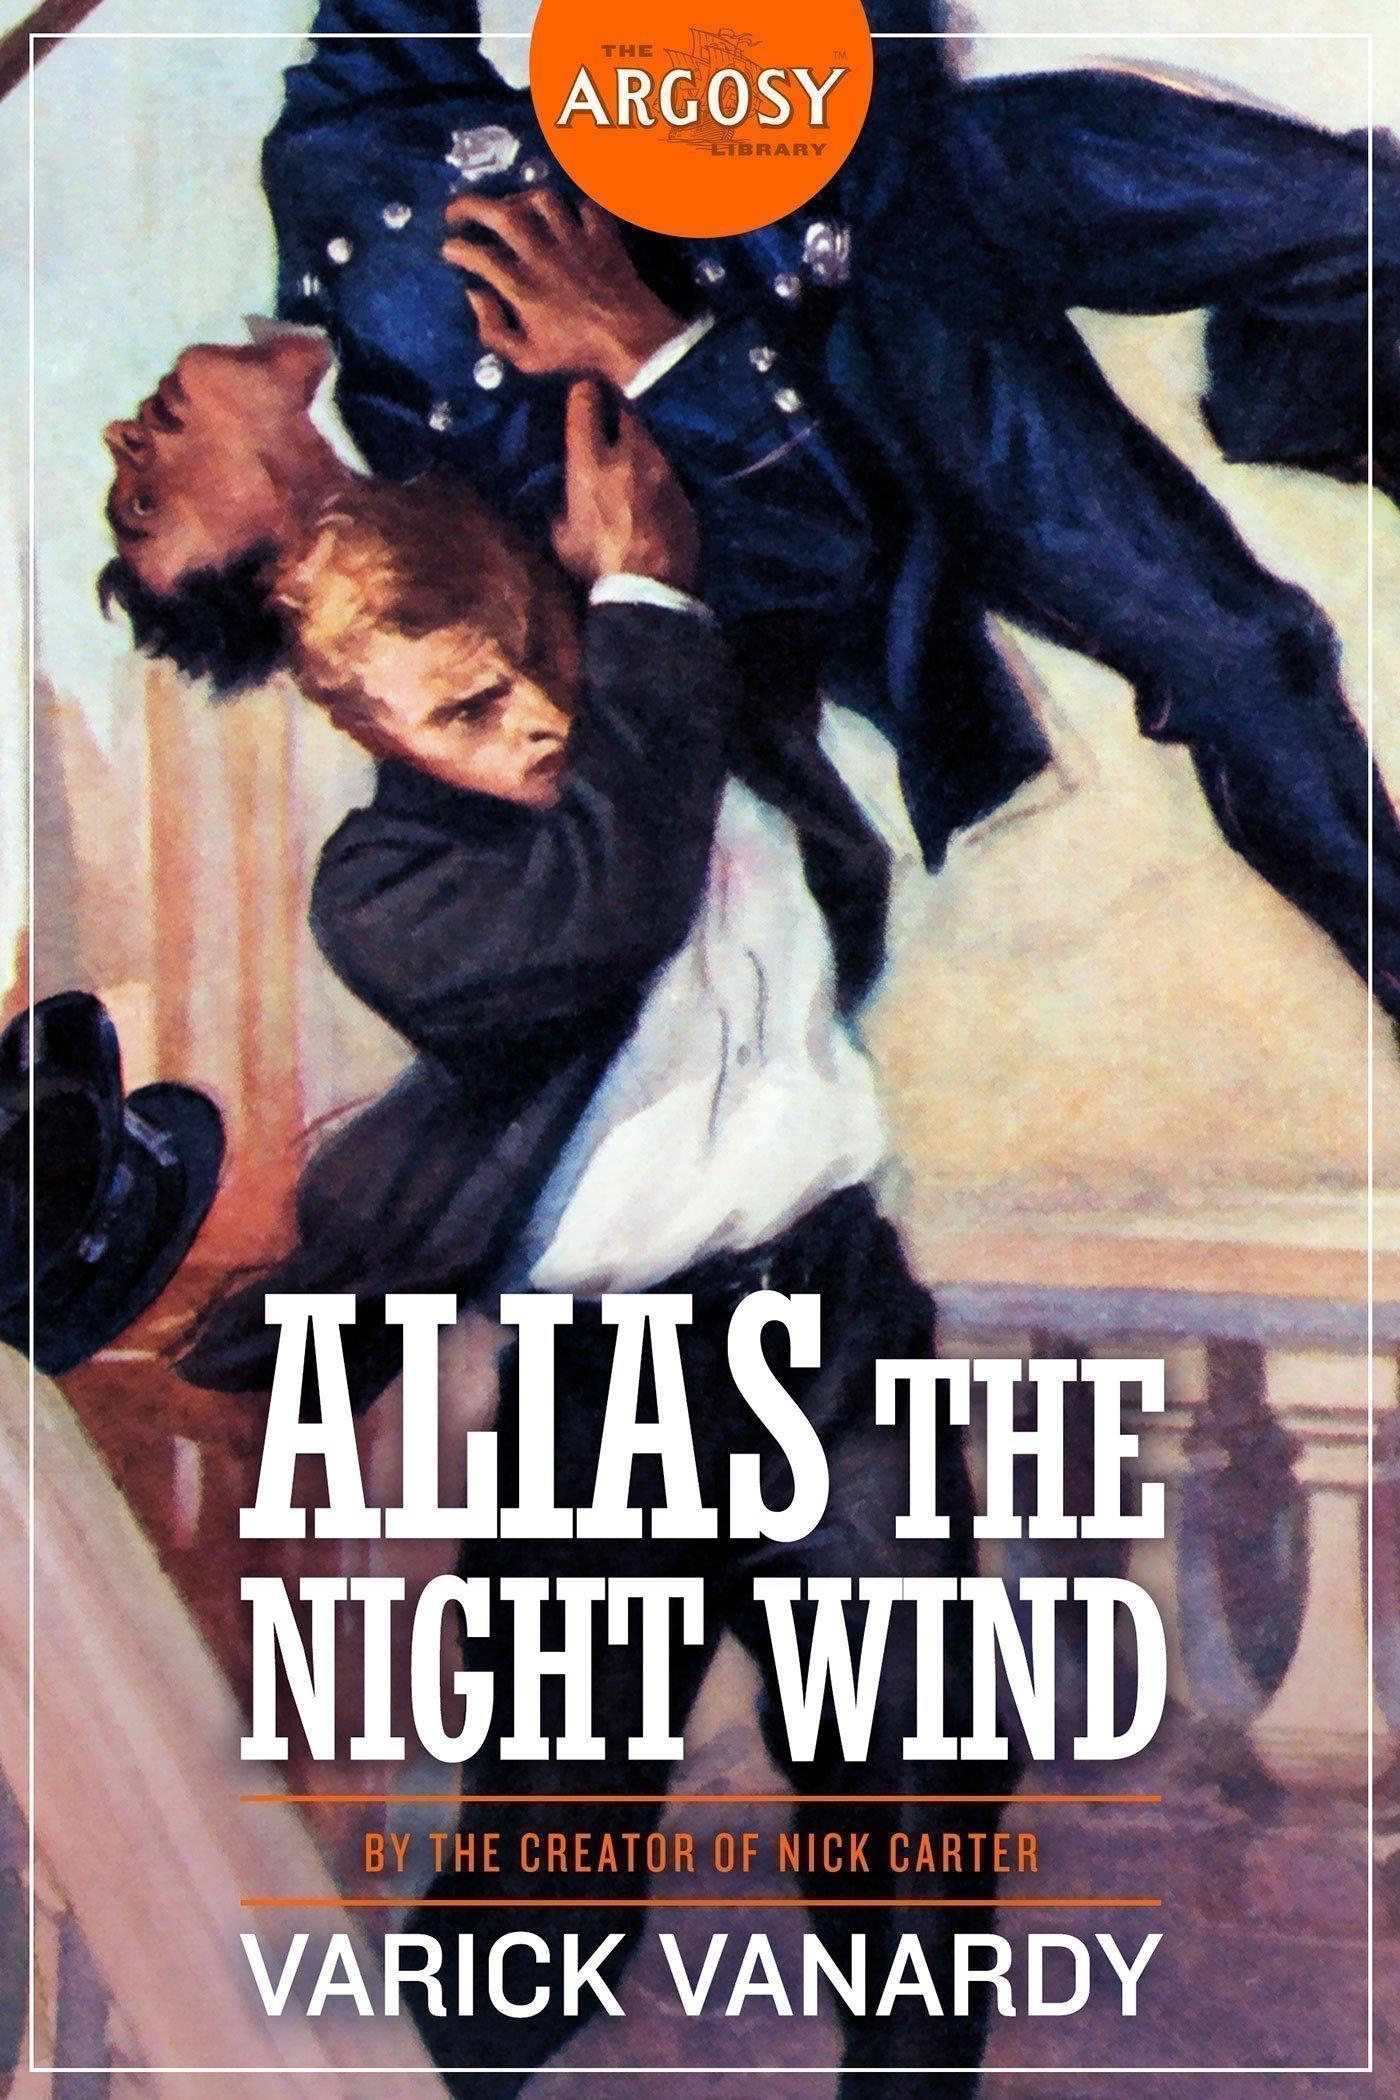 Alias the Night Wind (The Argosy Library) by Varick Vanardy